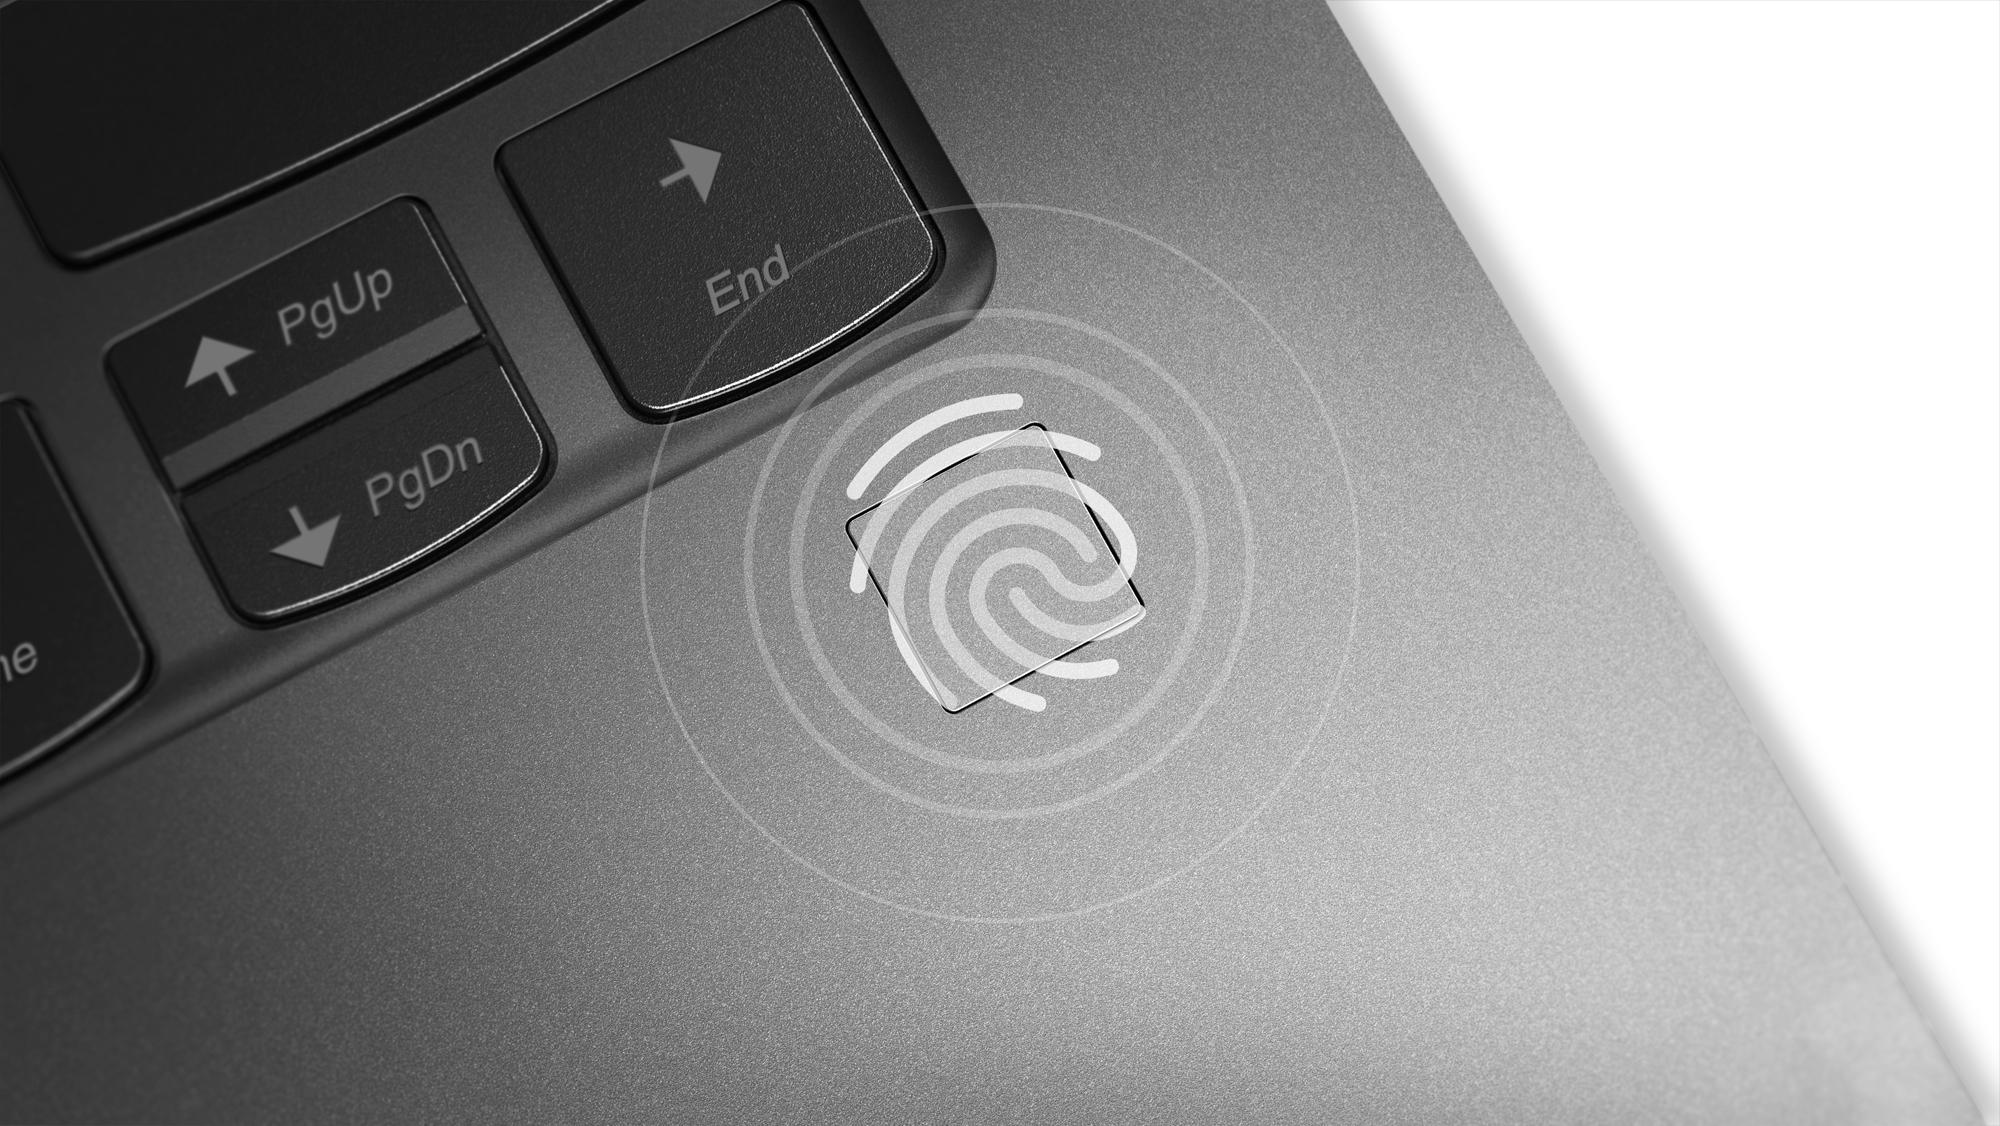 YOGA C930 fingerprint reader - LenardGunda com